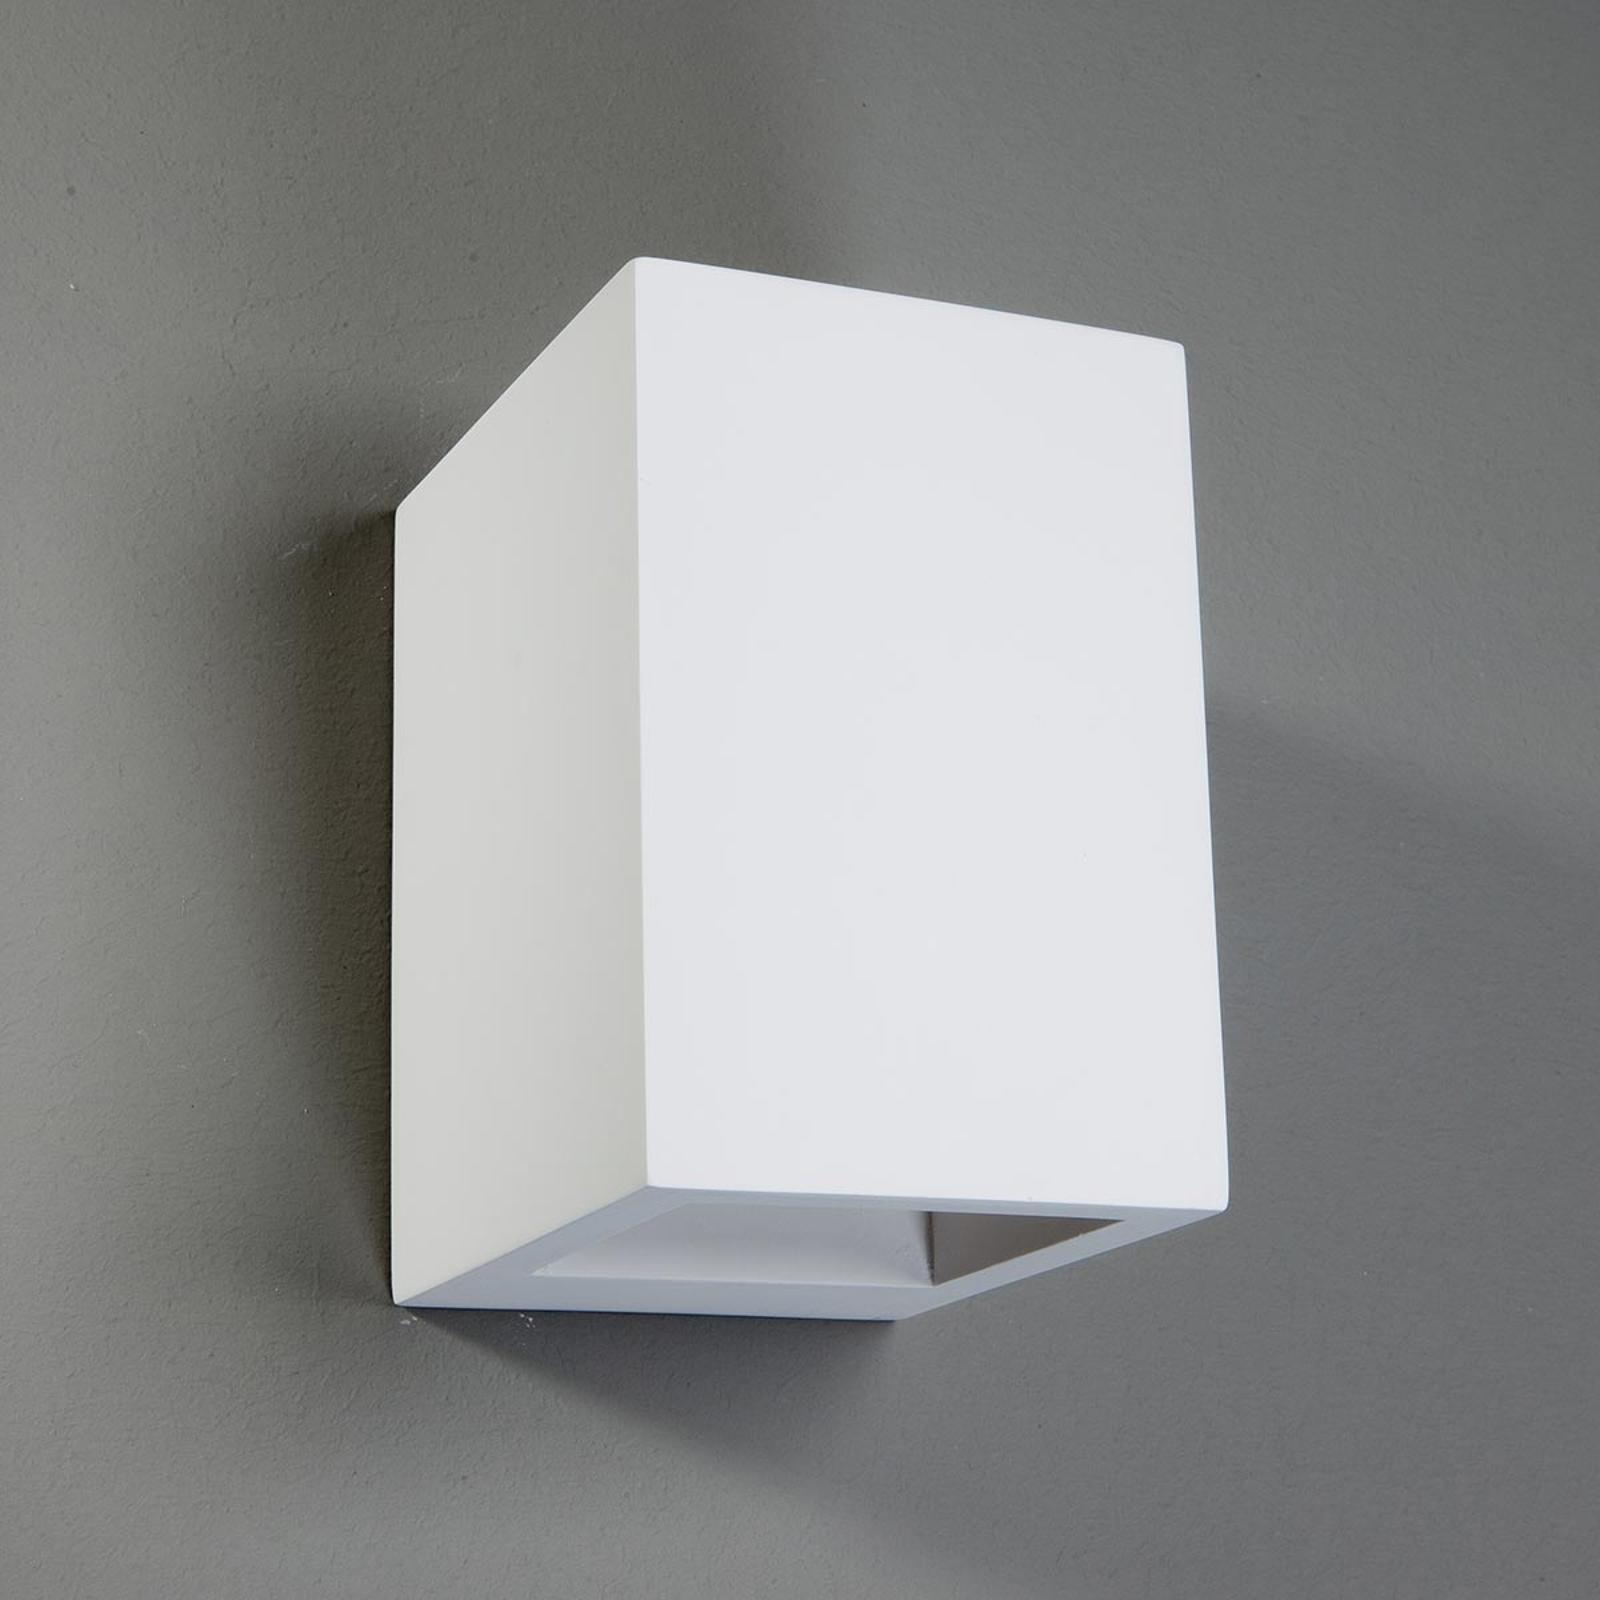 Aplique halógenoZaio rectangular pintable